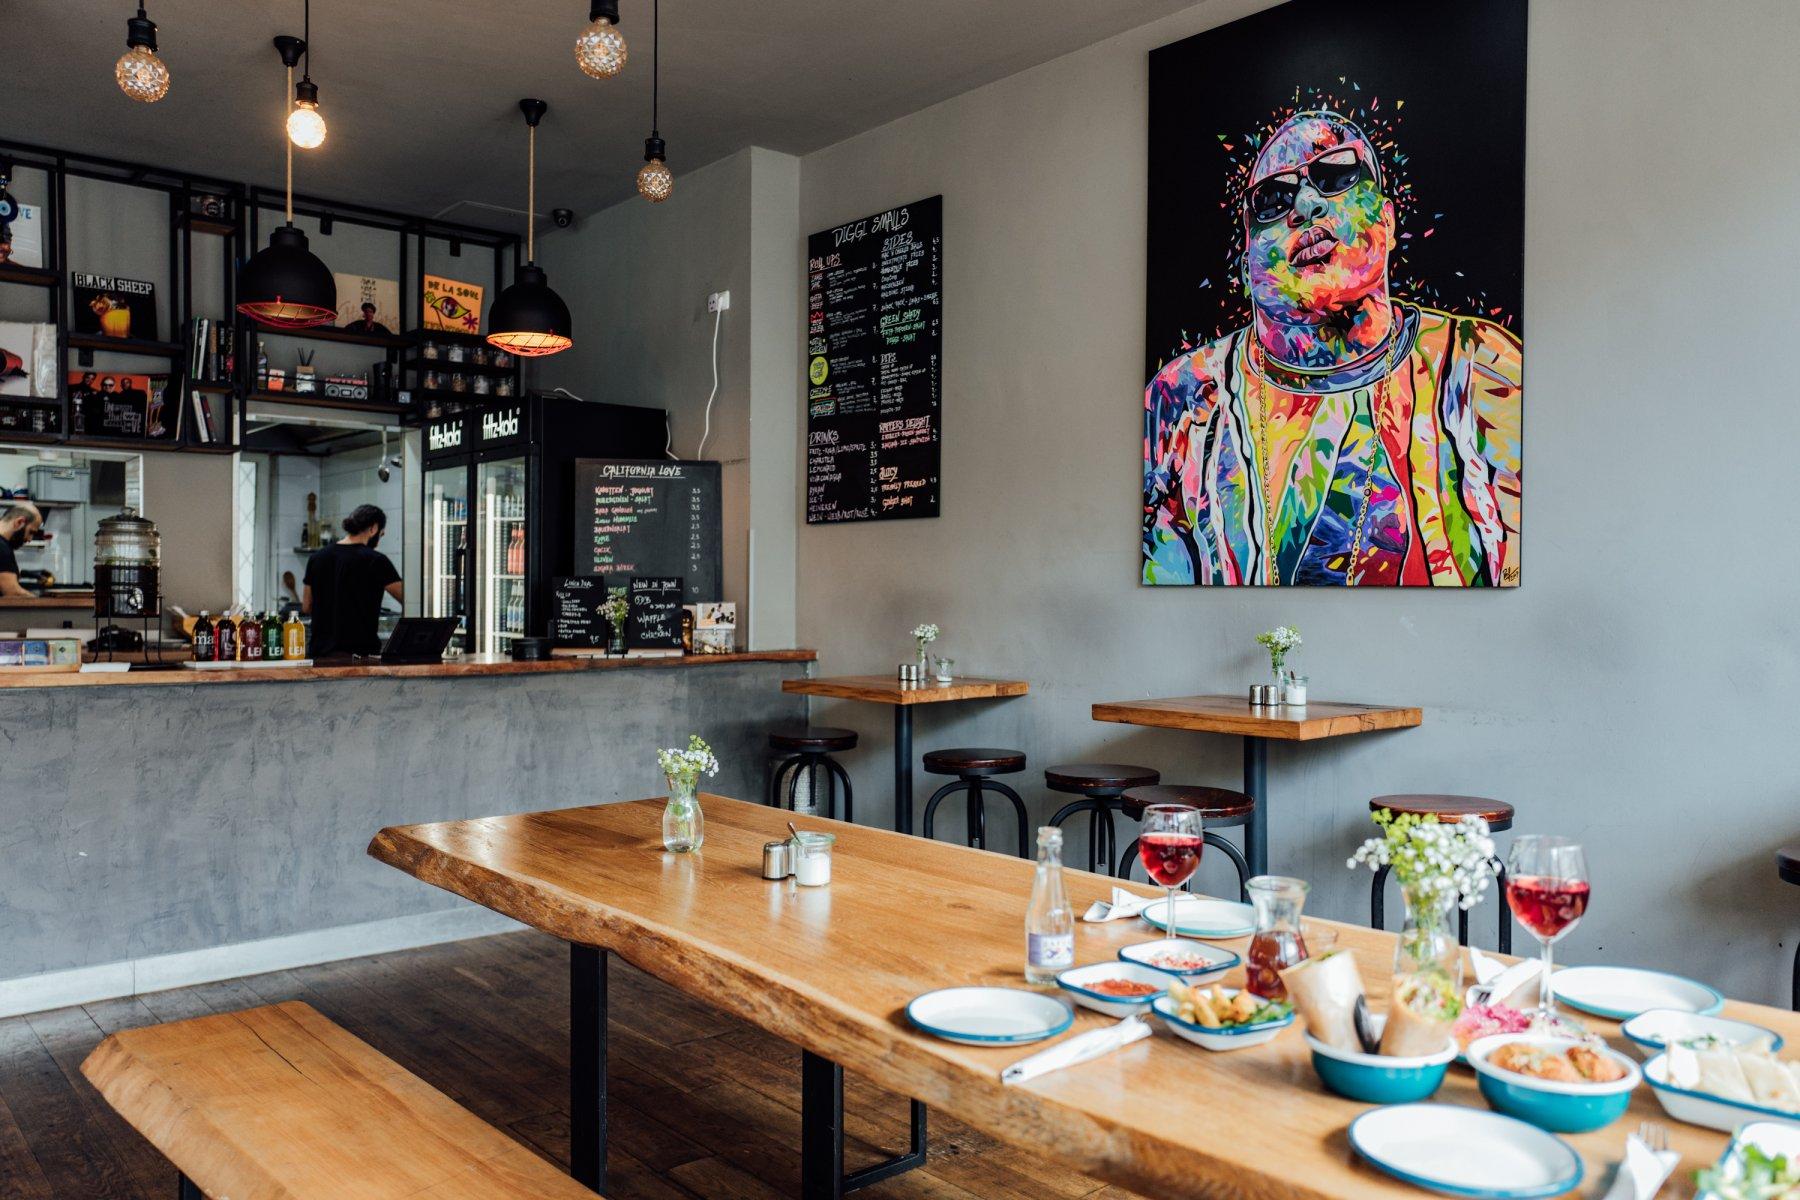 Geheimtipp Hamburg Essen & Trinken Restaurant Grindel Diggi Smalls Lisa Knauer 8